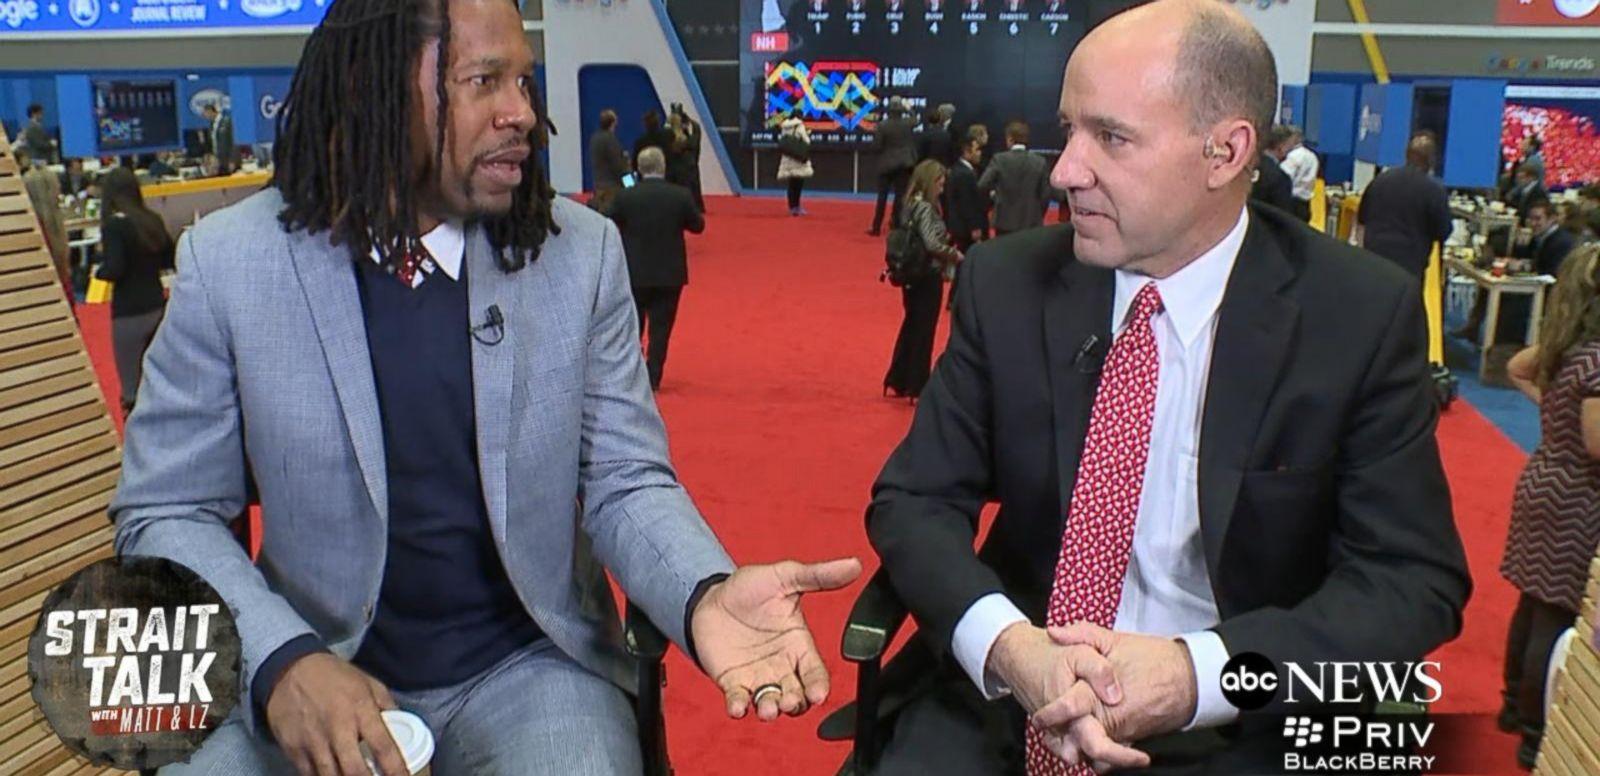 Strait Talk Matt & LZ: What to Expect in the GOP Debate